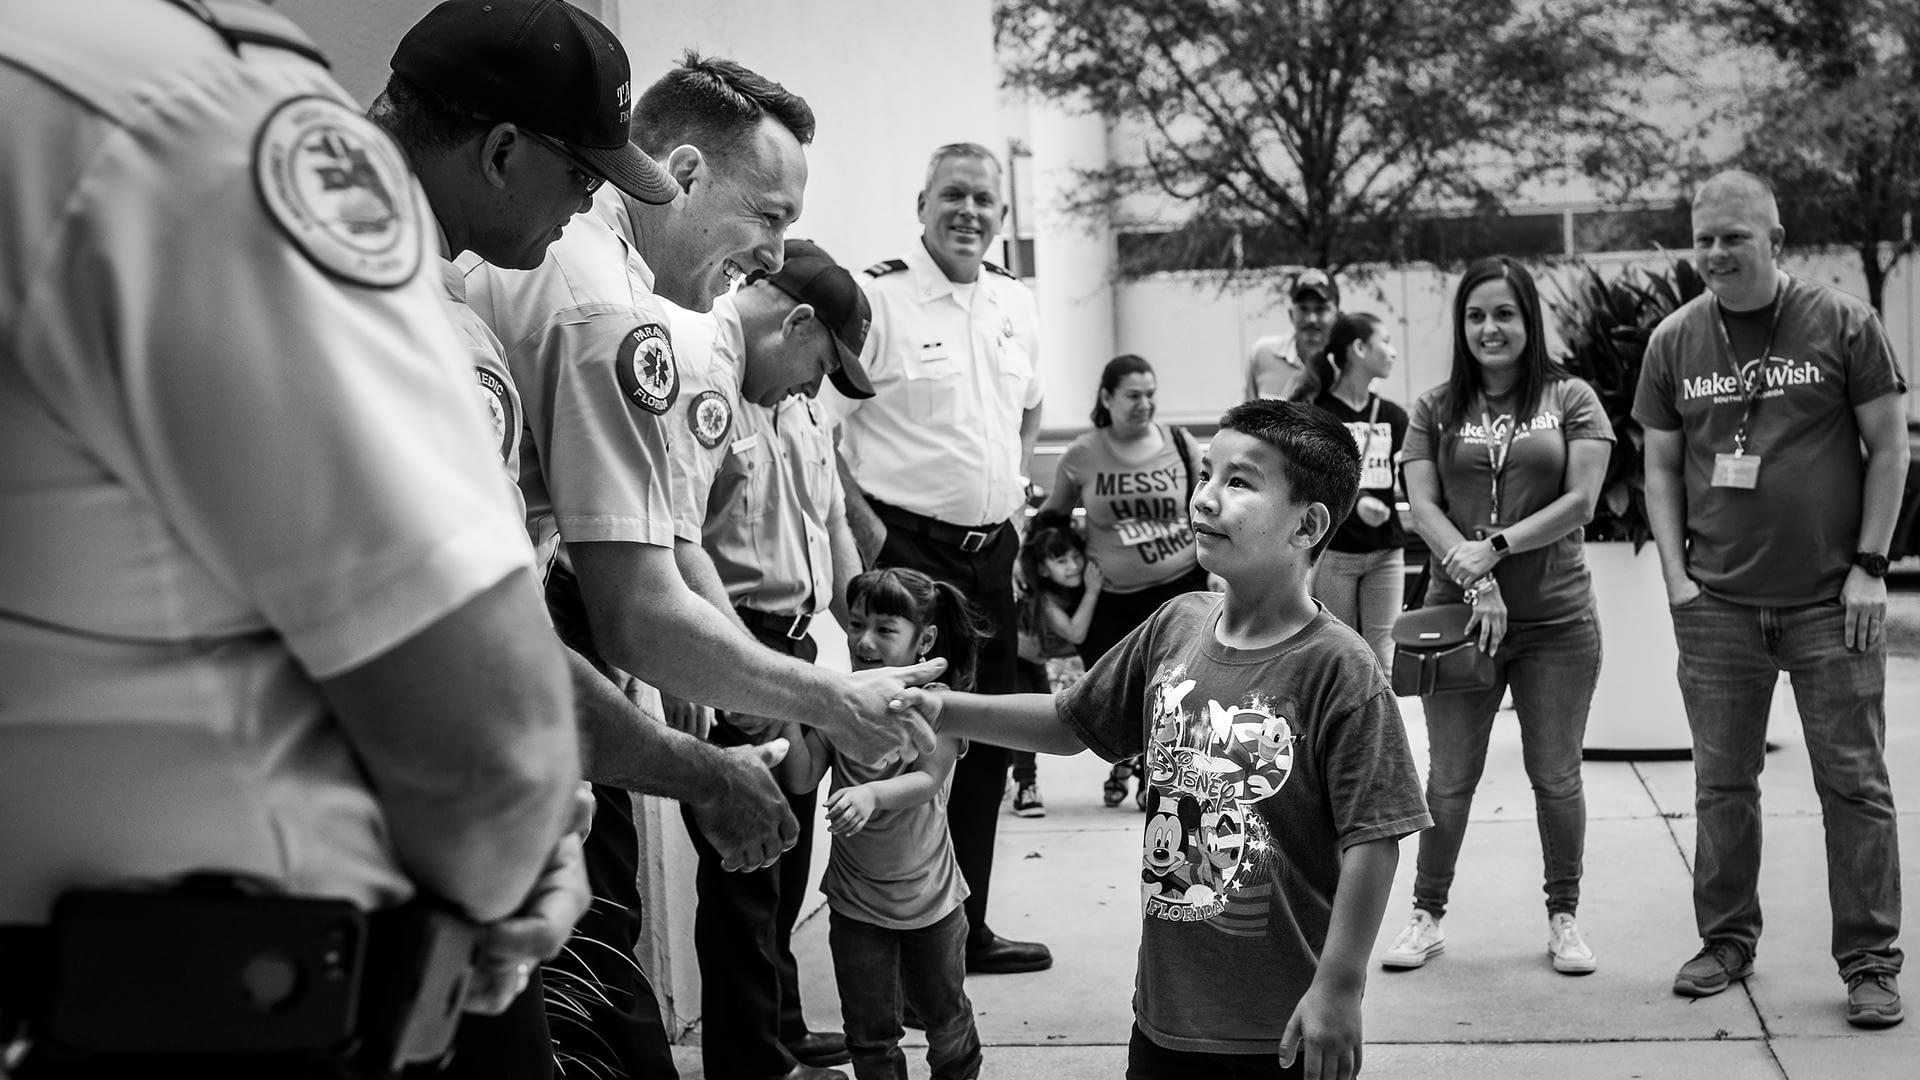 Make-A-Wish Boy Firefighters Shake Hands